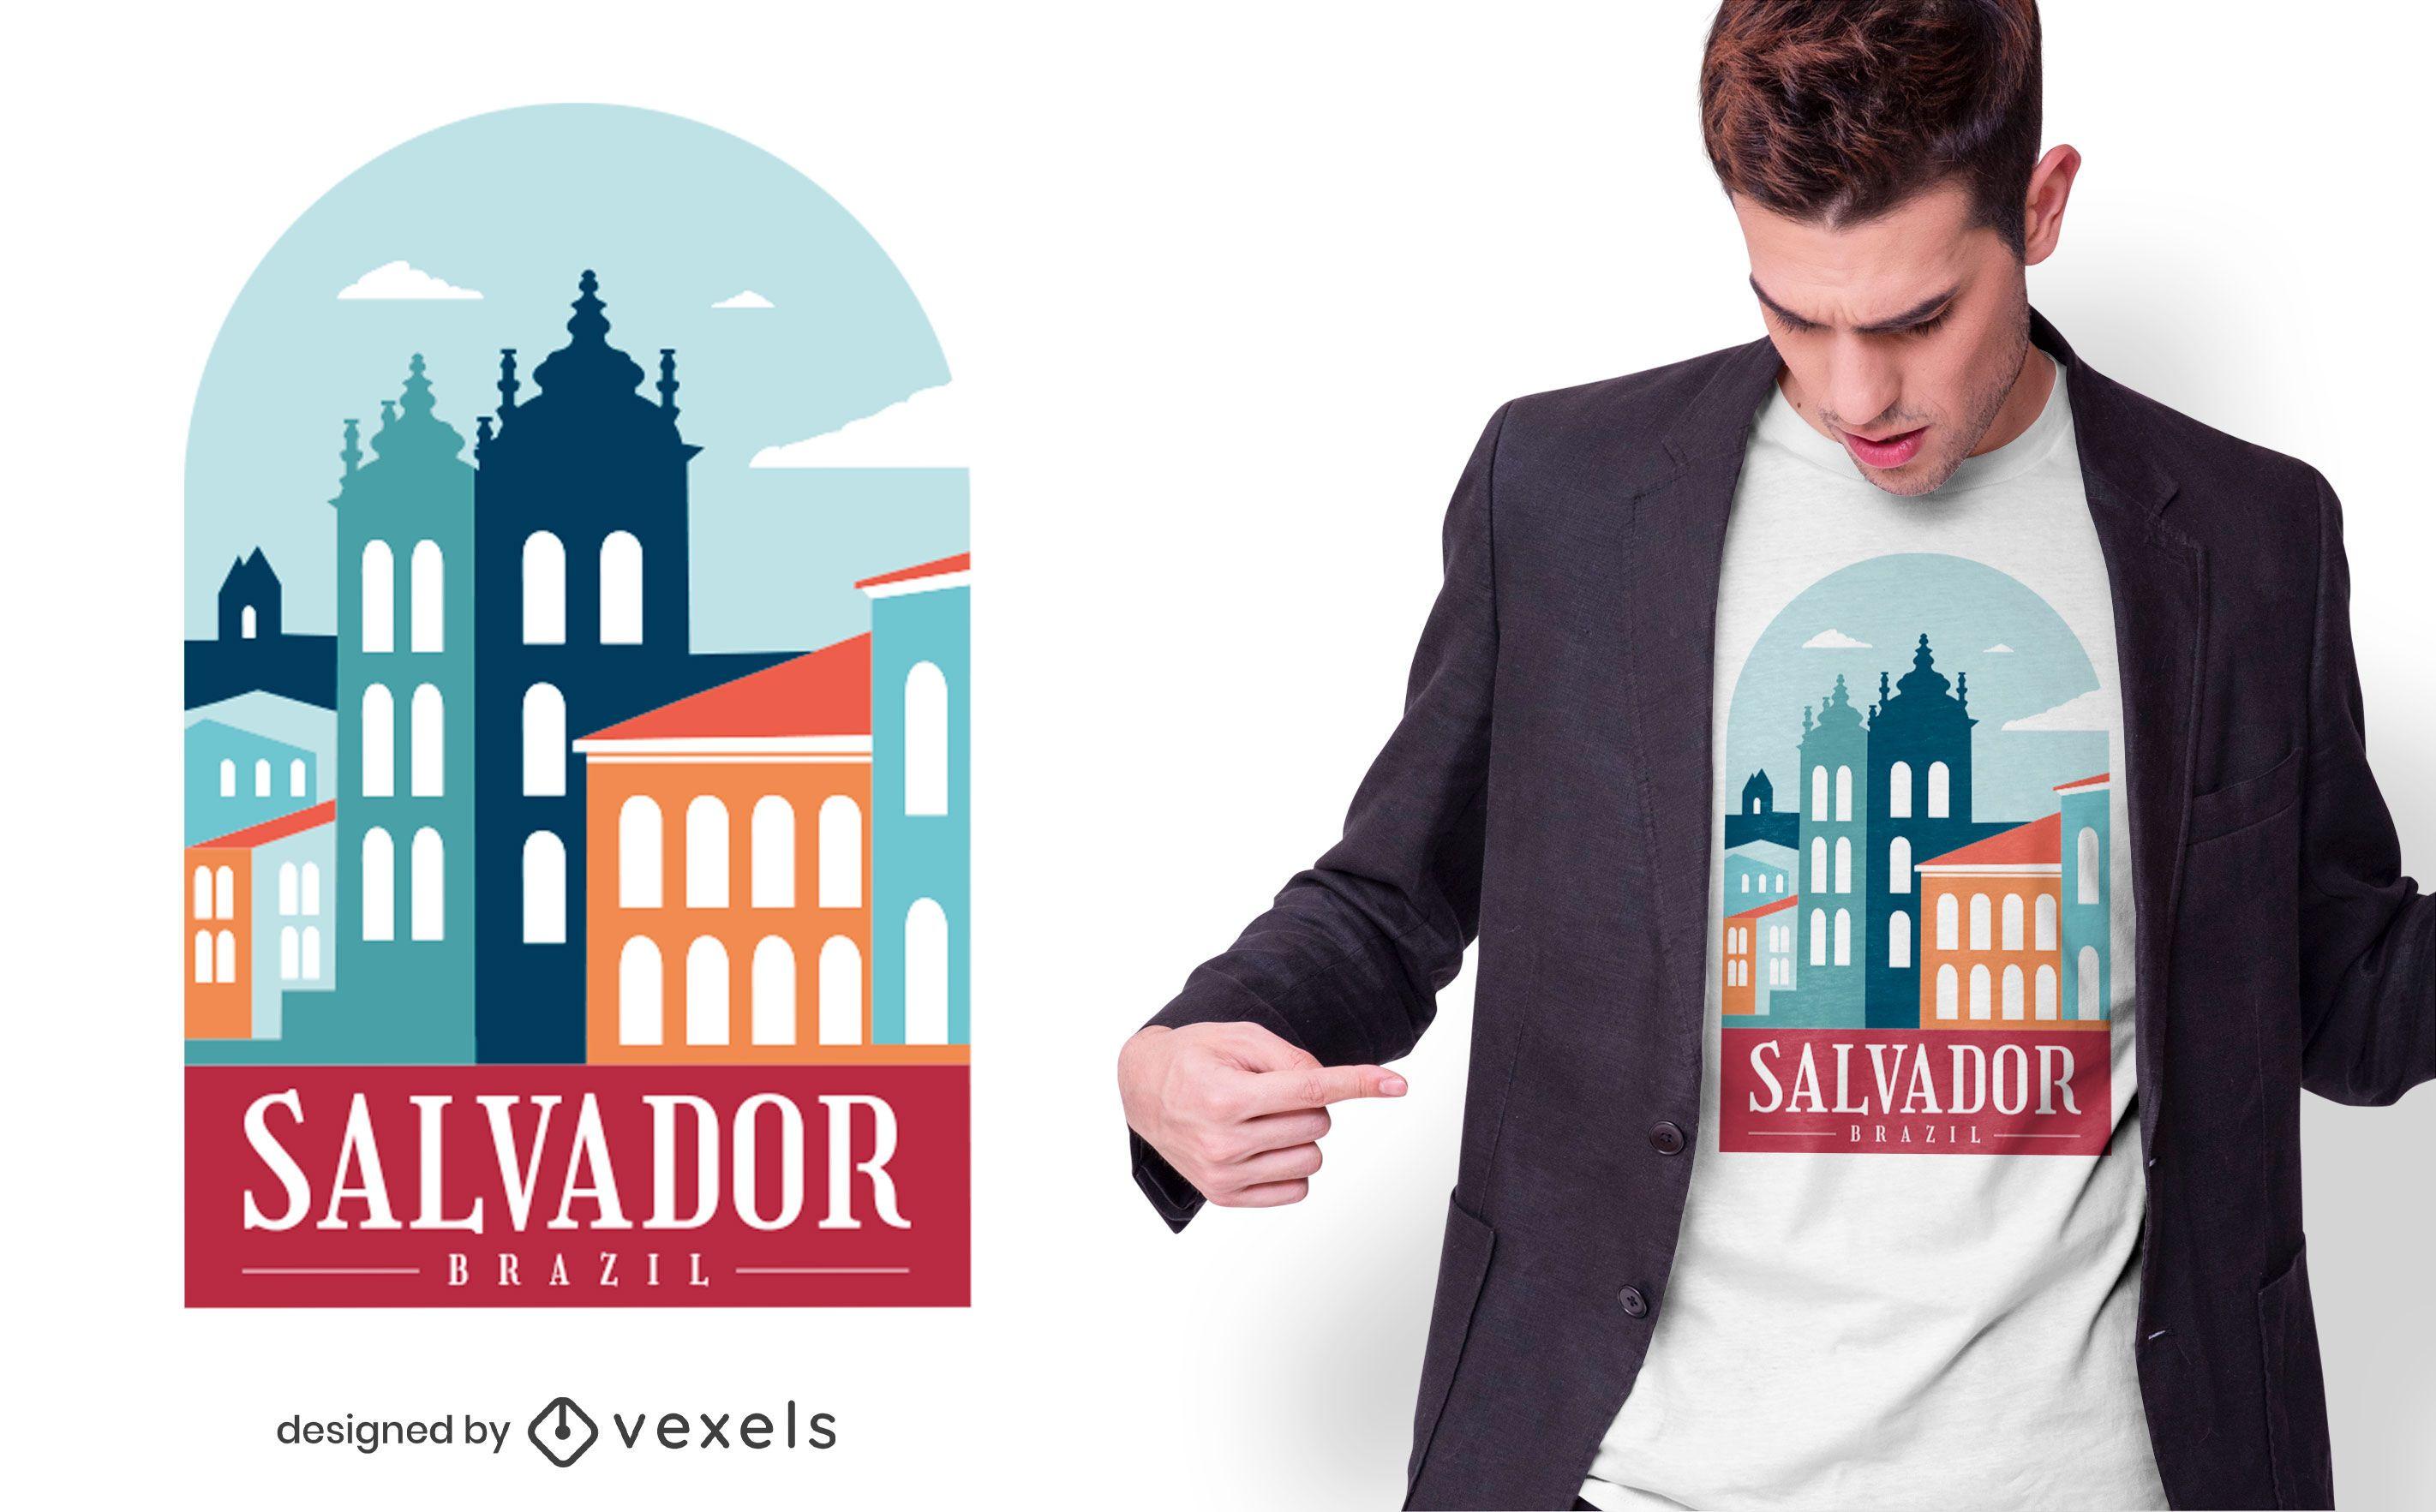 Salvador brazil t-shirt design